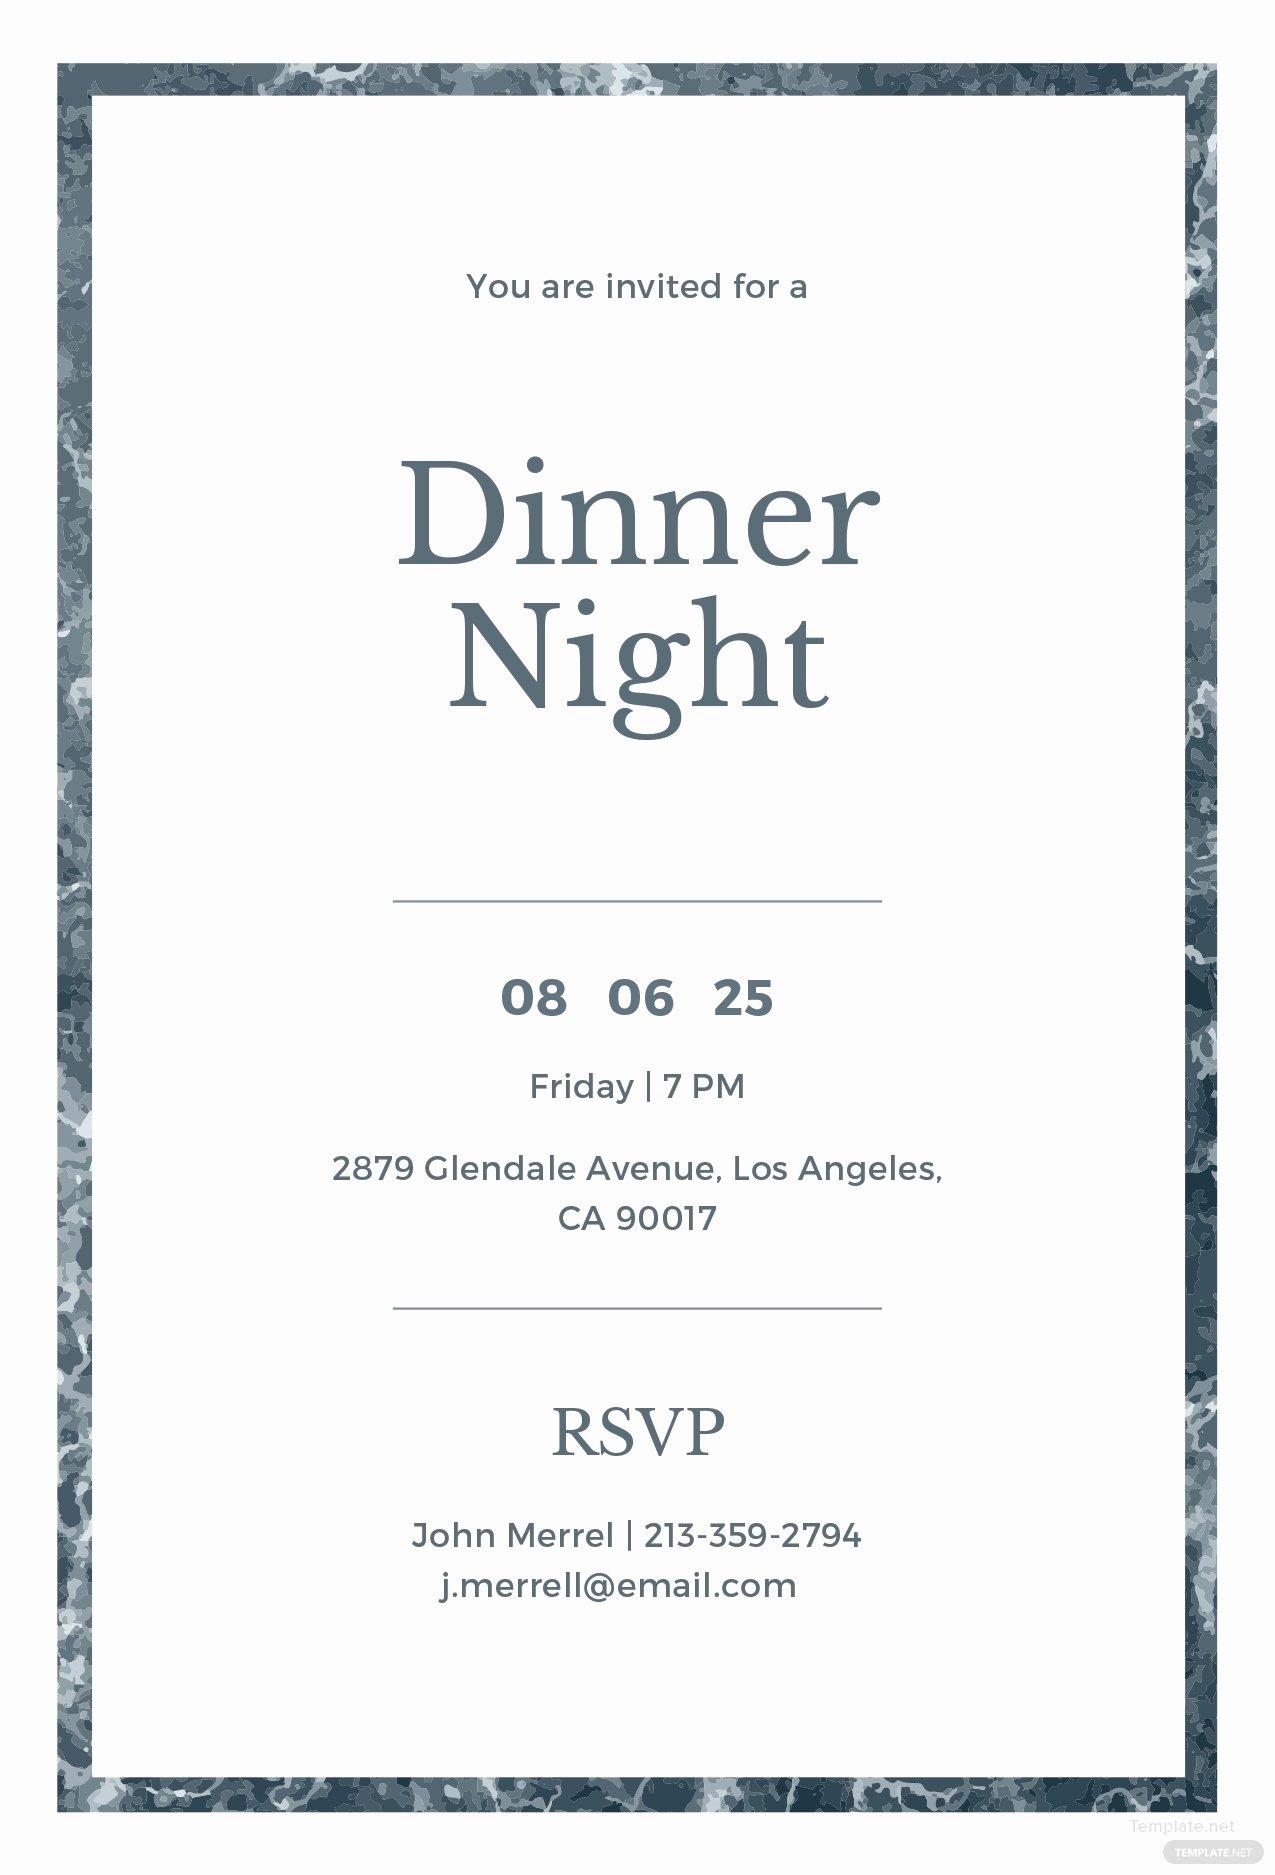 Dinner Invite Template Word Luxury Free Sample Dinner Invitation Template In Adobe